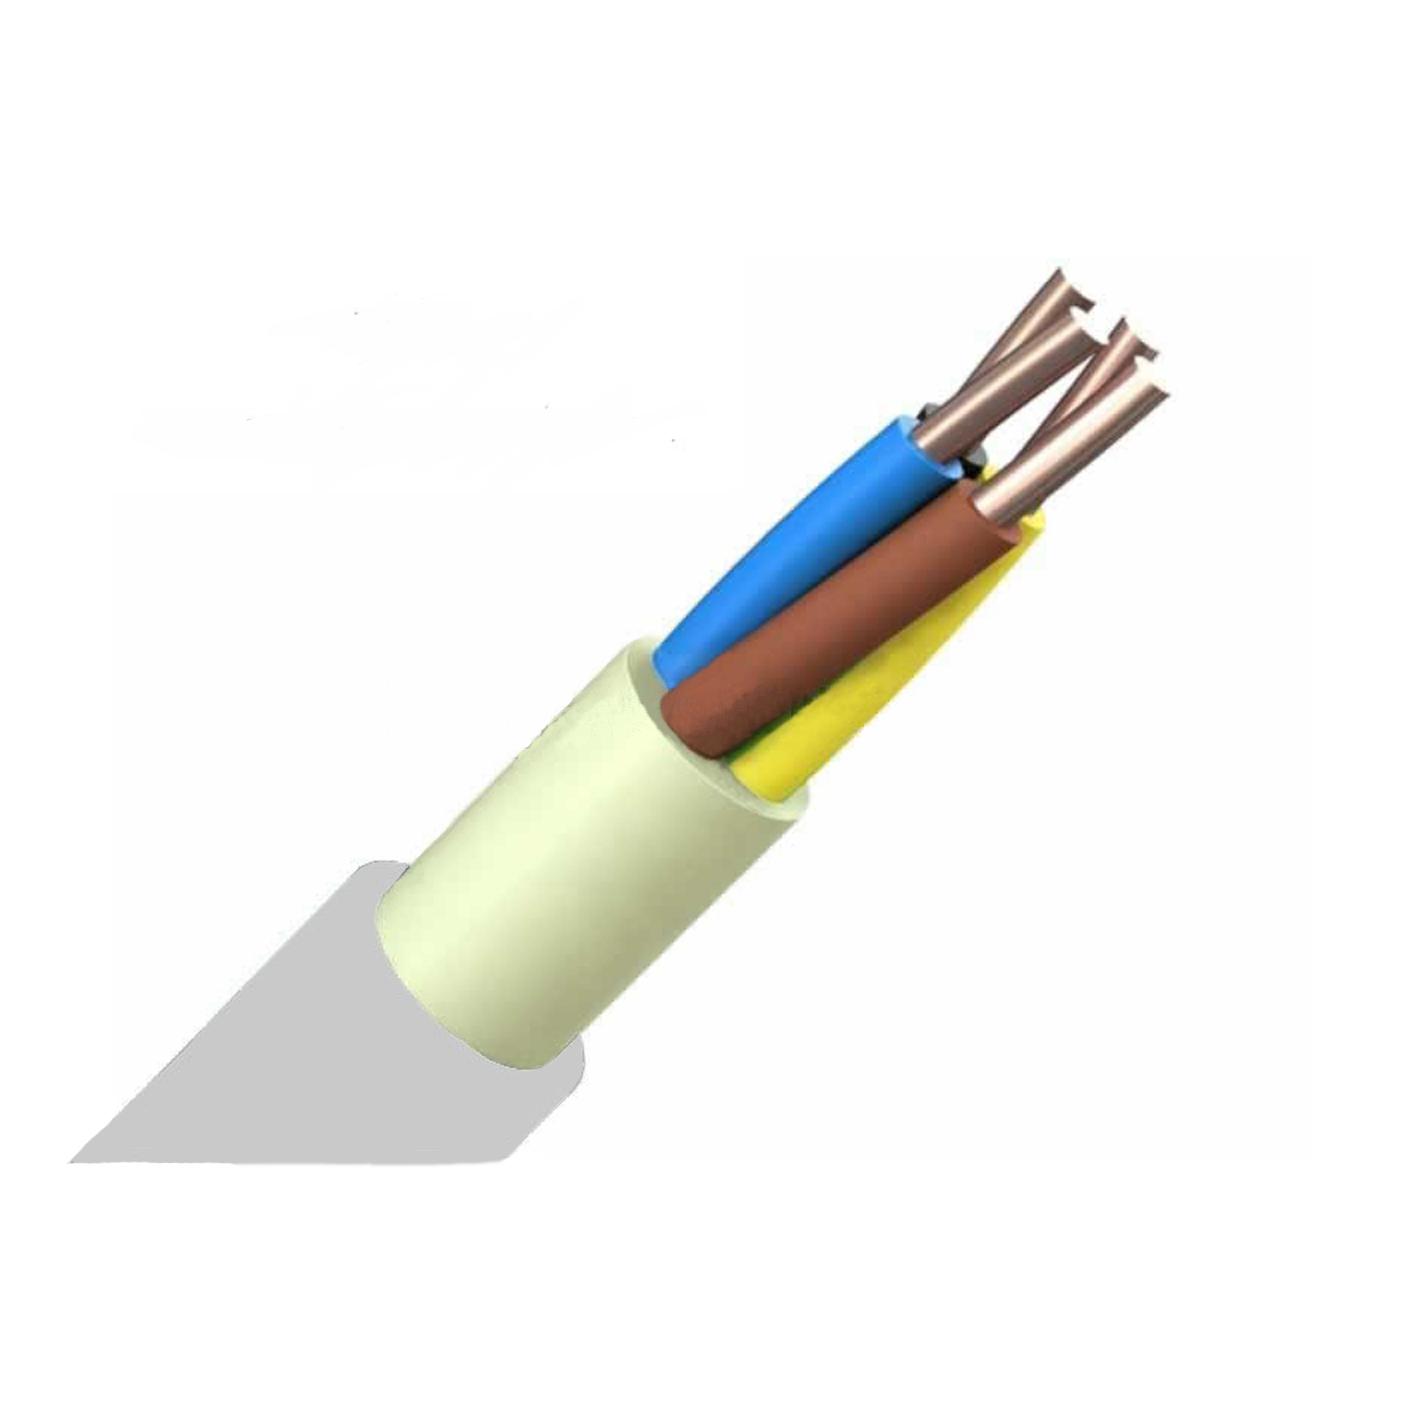 Öznur 5x1.5 NYM (NVV) Kablo